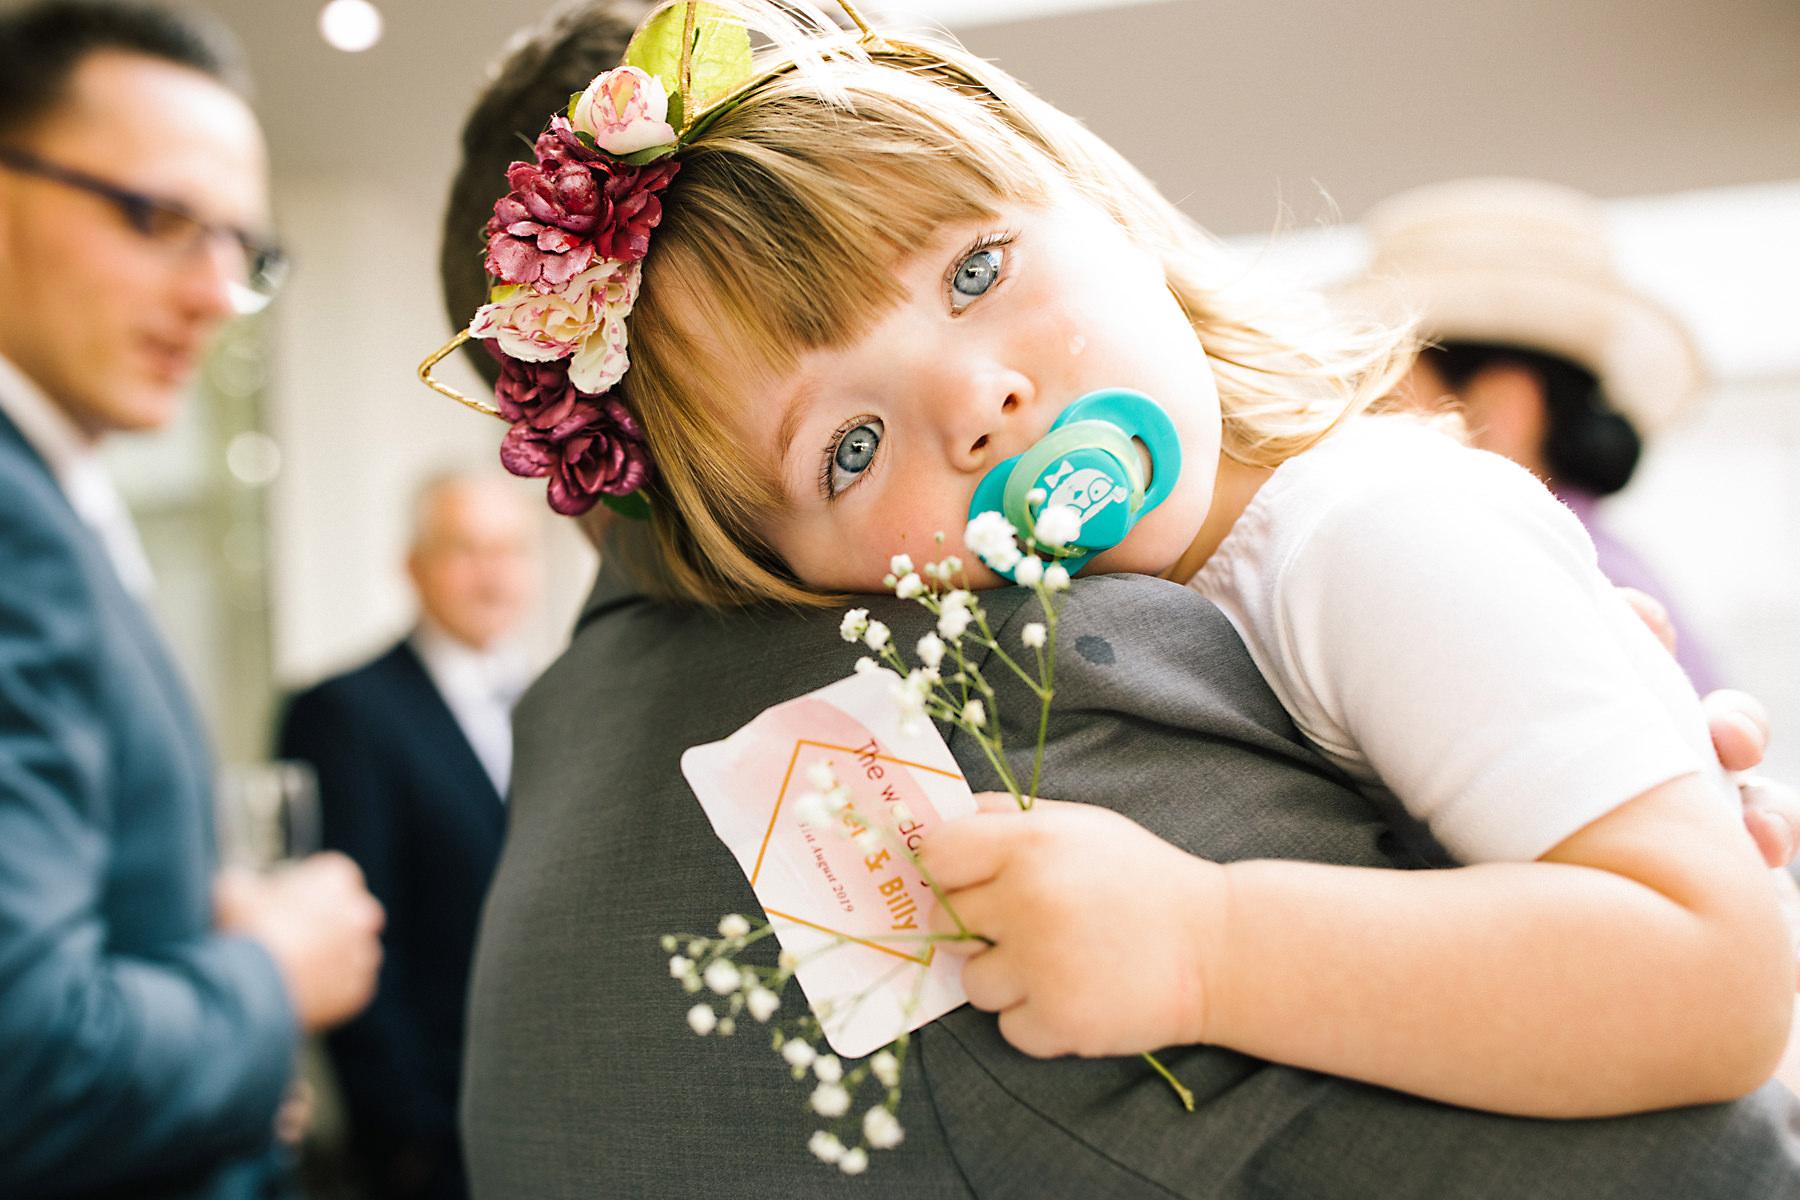 tired flowergirl at wedding